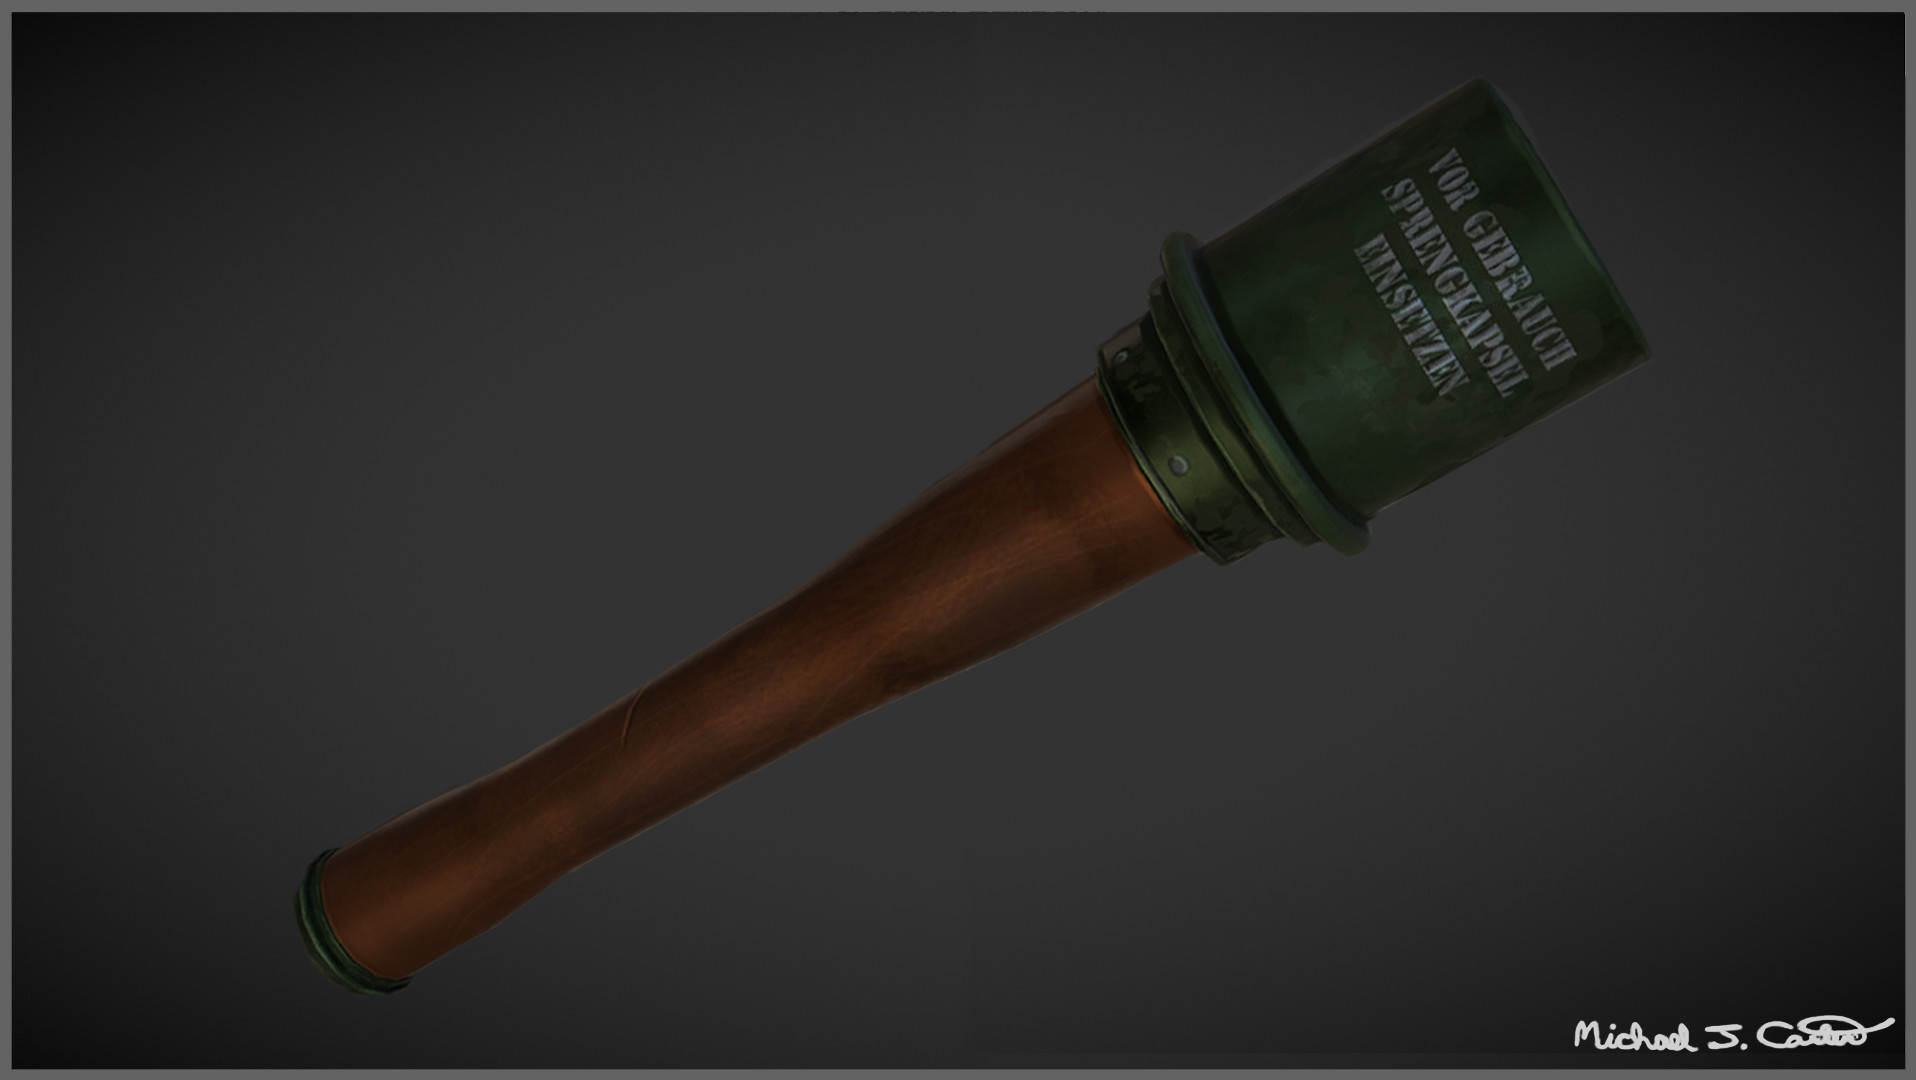 Michael jake carter mcarter stick grenade front image